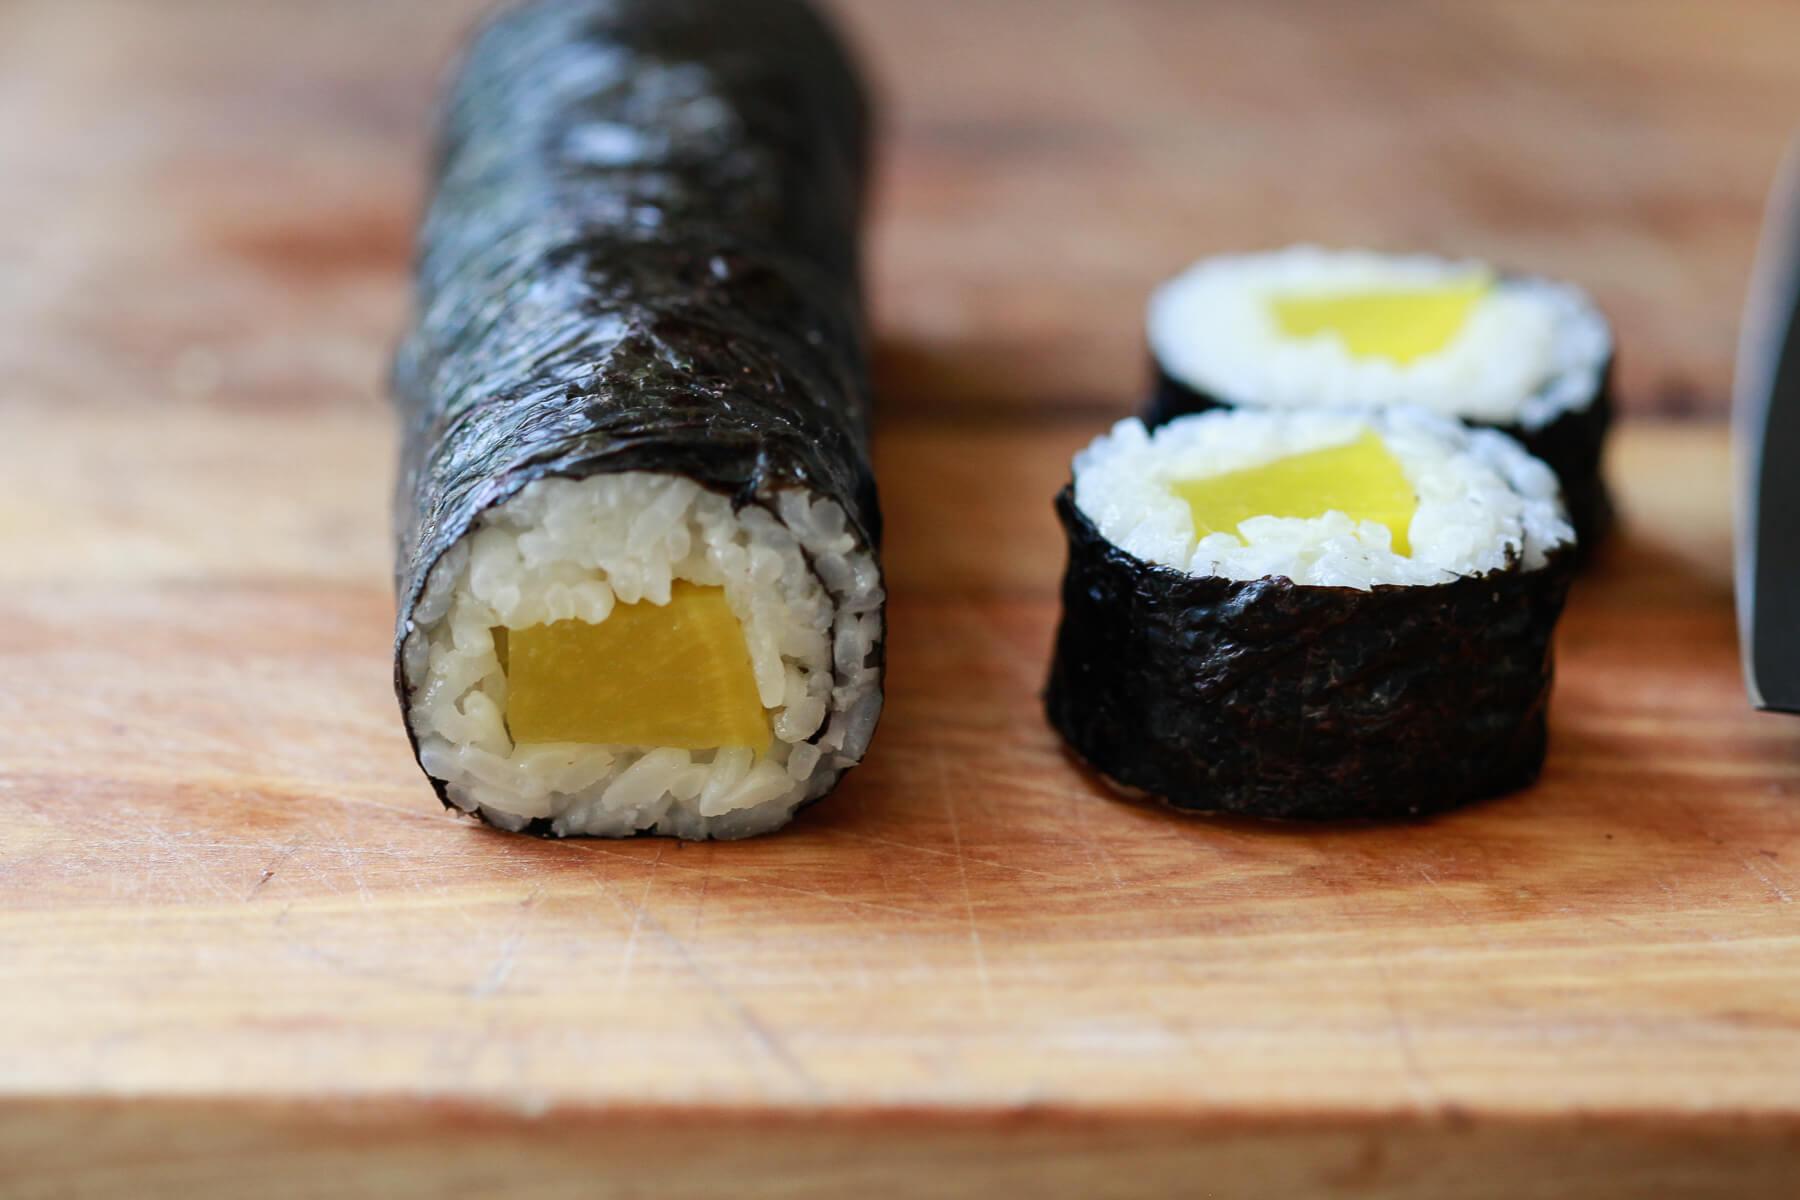 Cutting an oshinko sushi roll into slices.